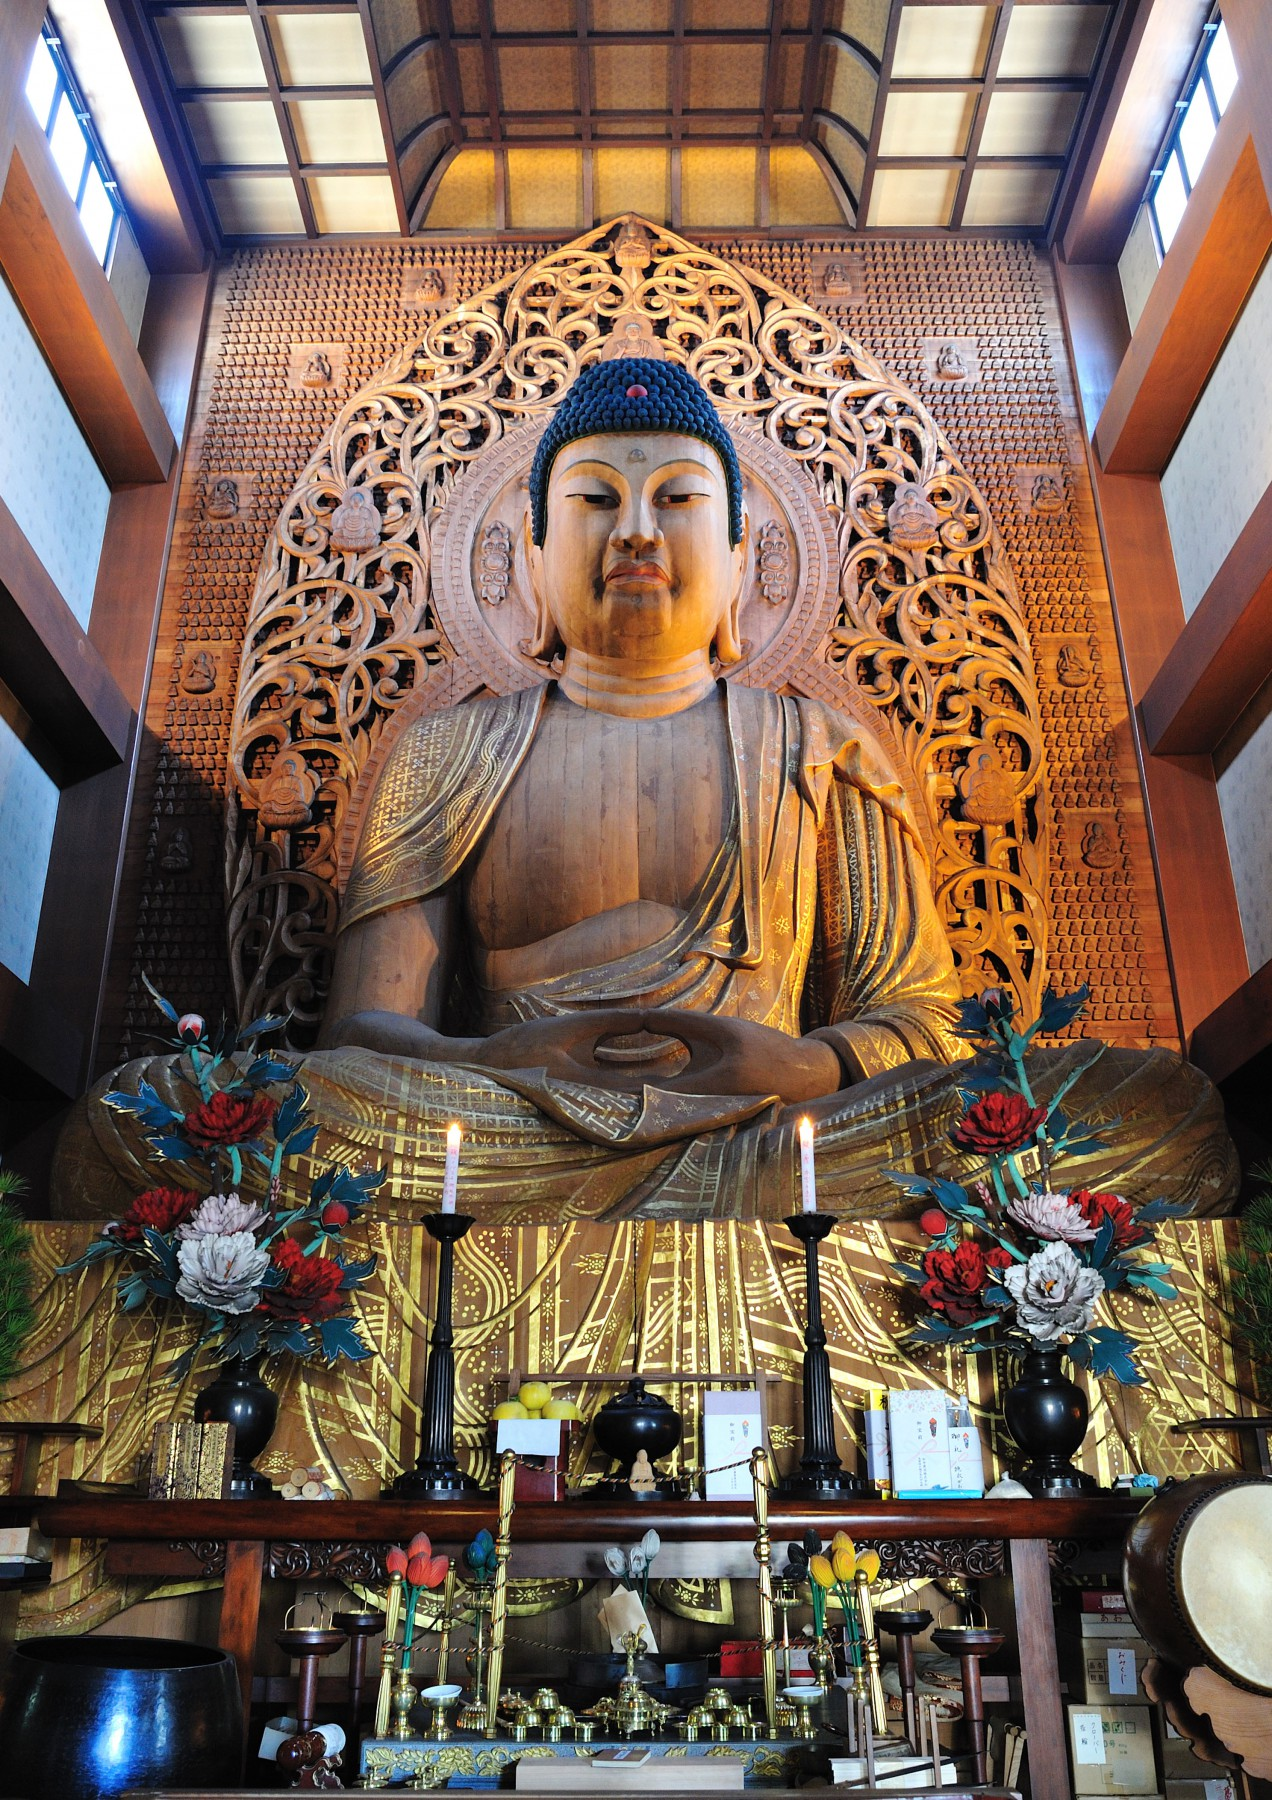 福岡大仏(2009)の画像